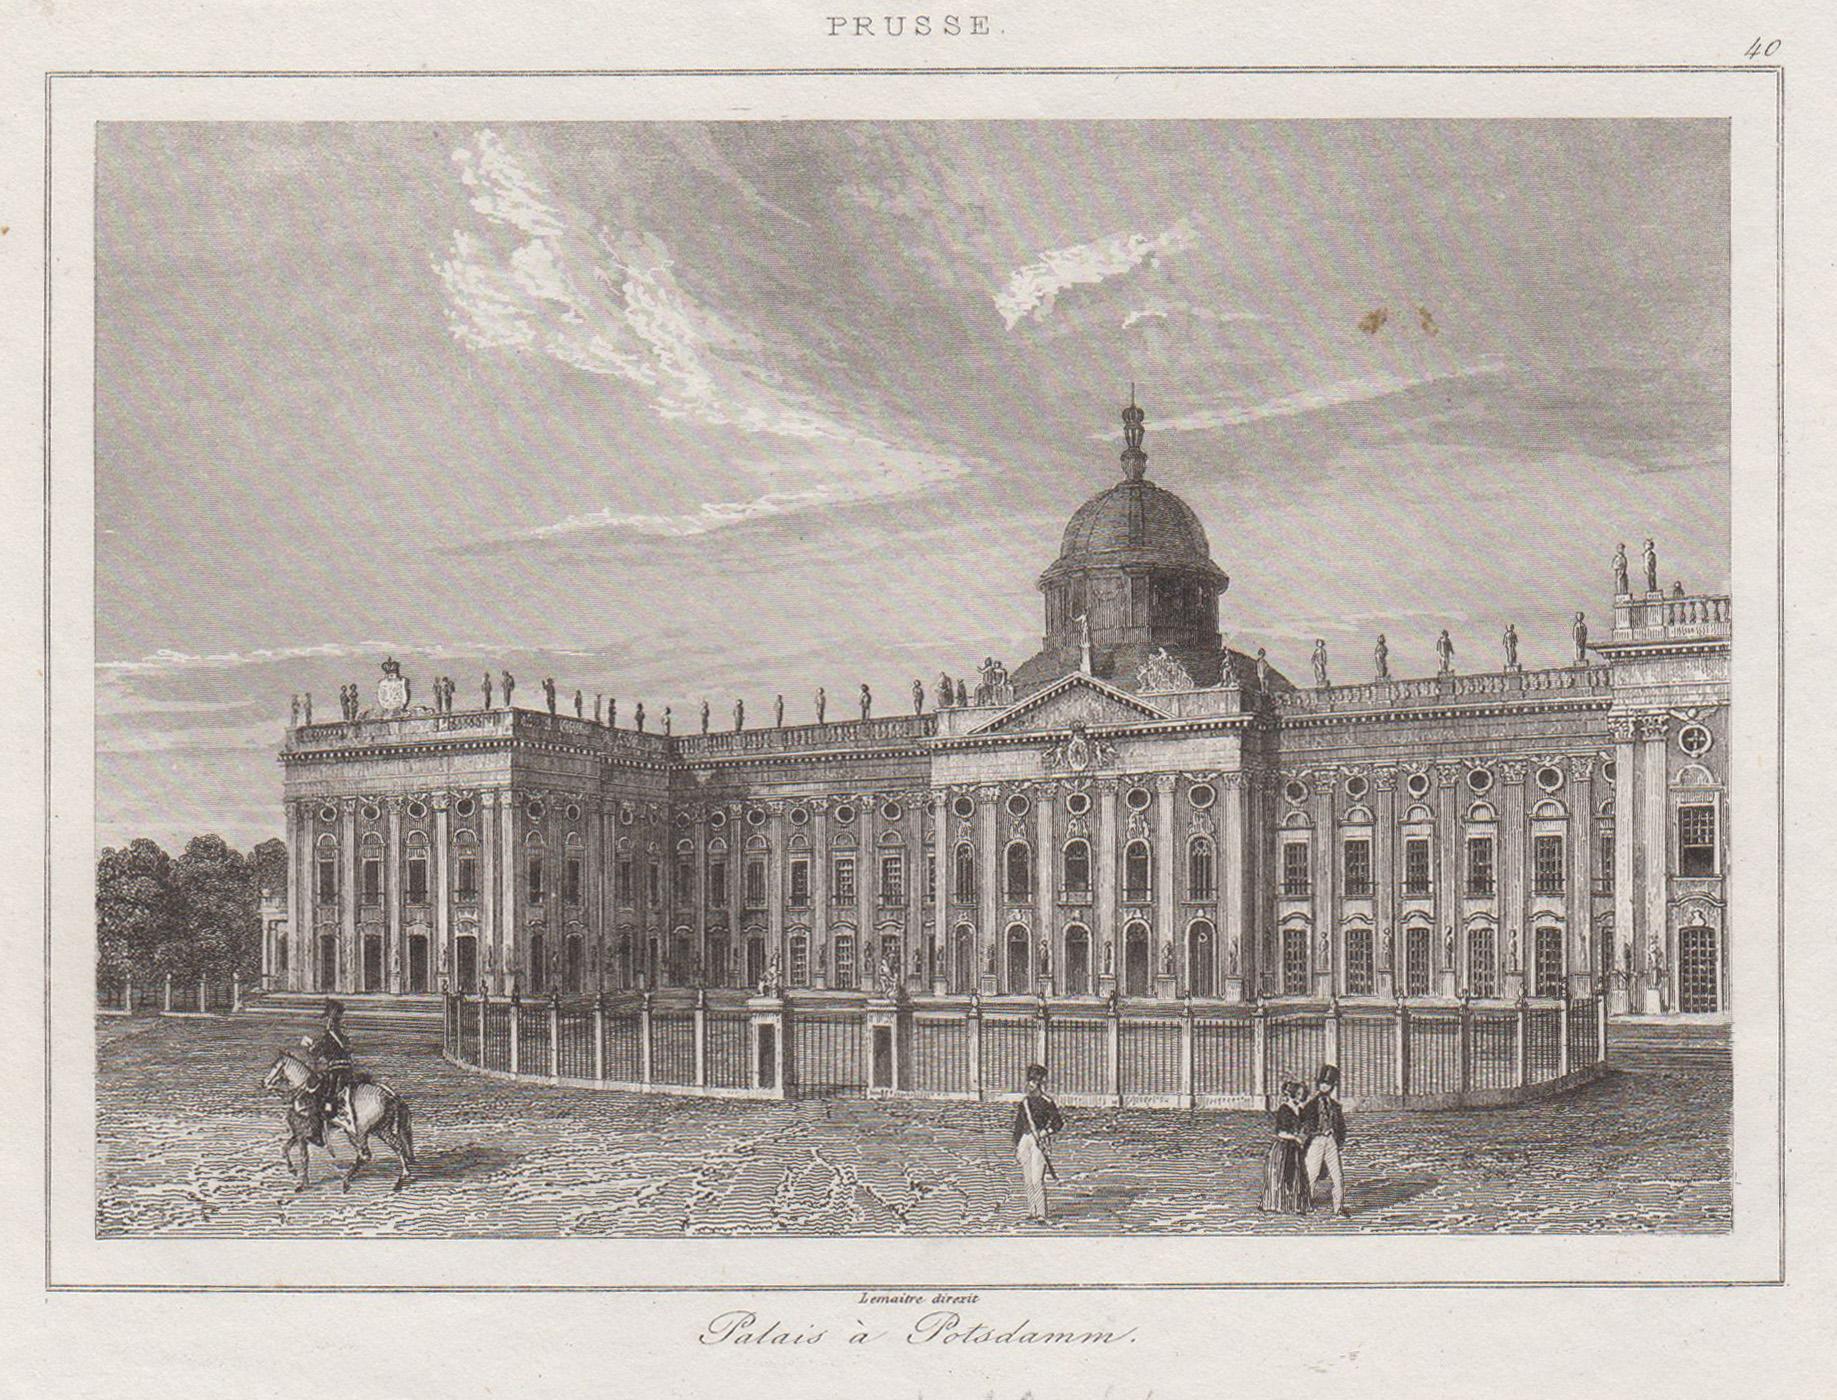 Neues Palais.: Potsdam - Park